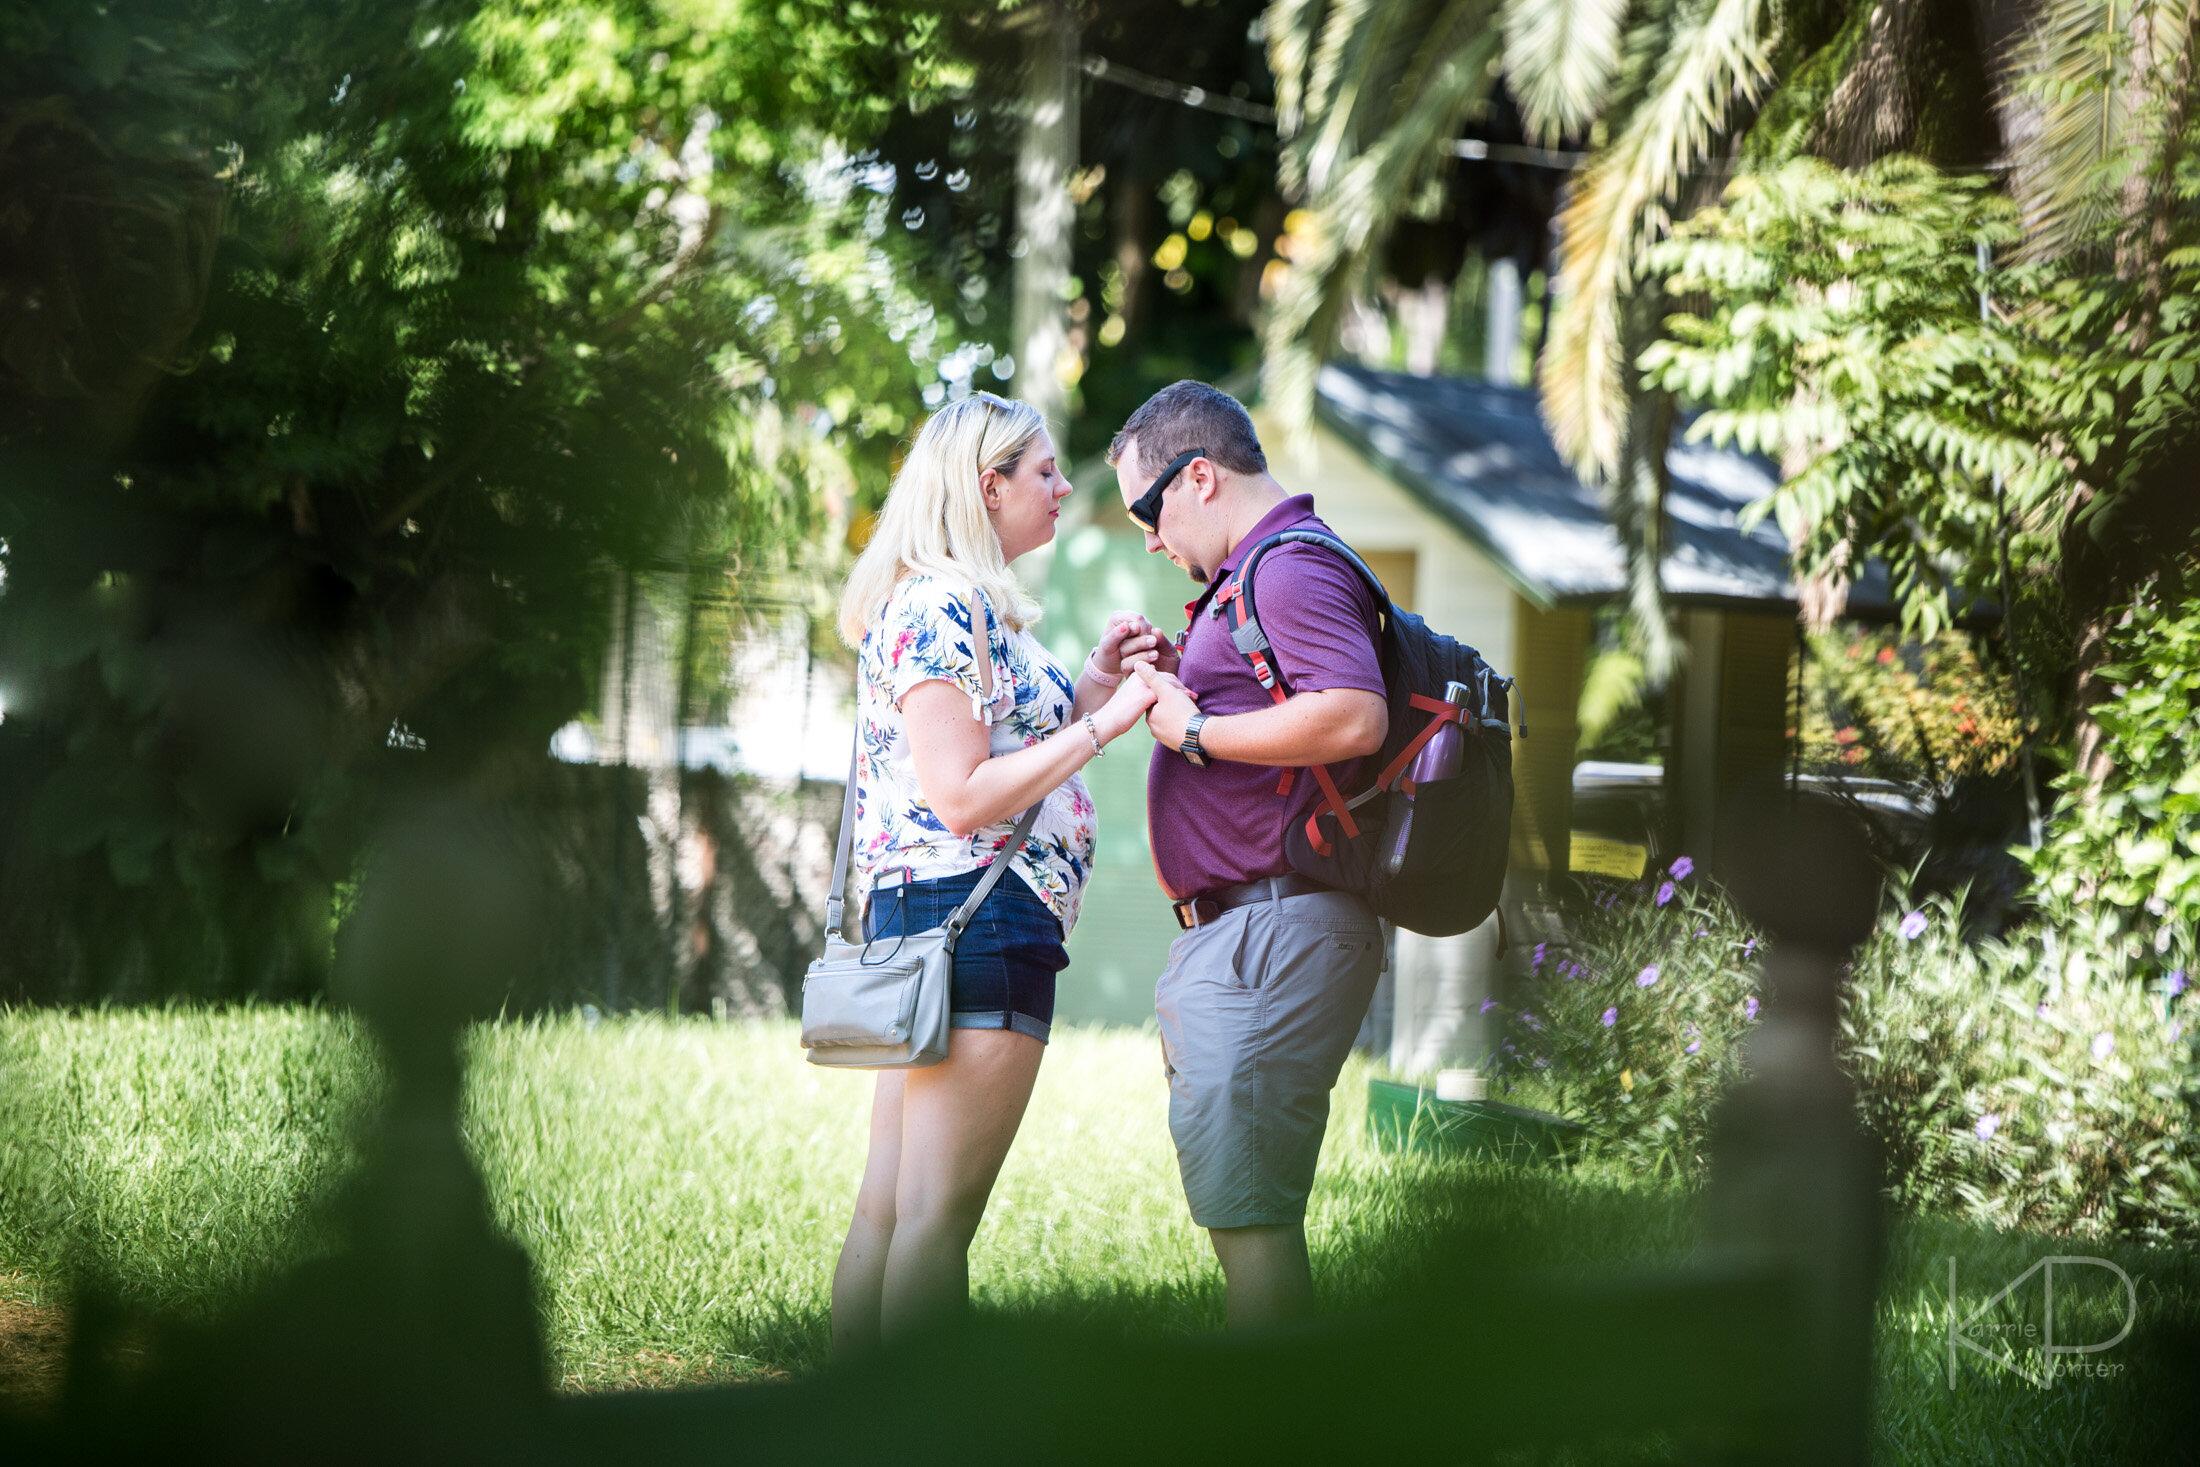 Ernest Hemingway Home Undercover Proposal